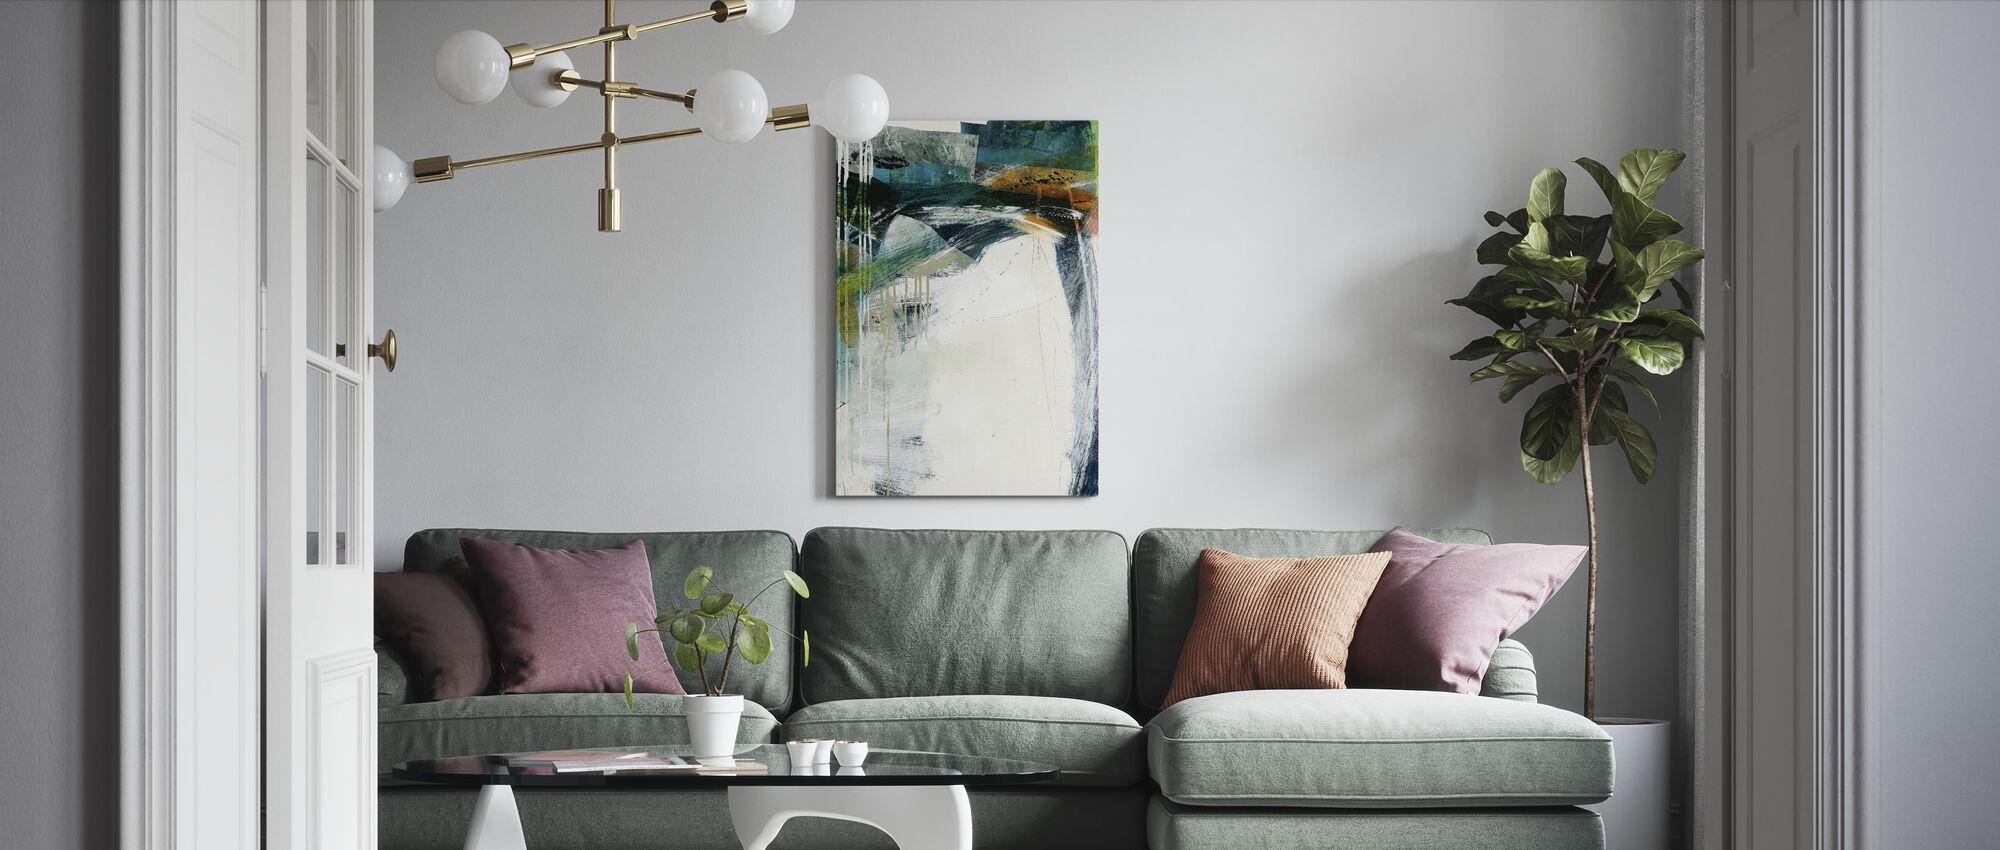 Turbulence iii - Canvas print - Living Room